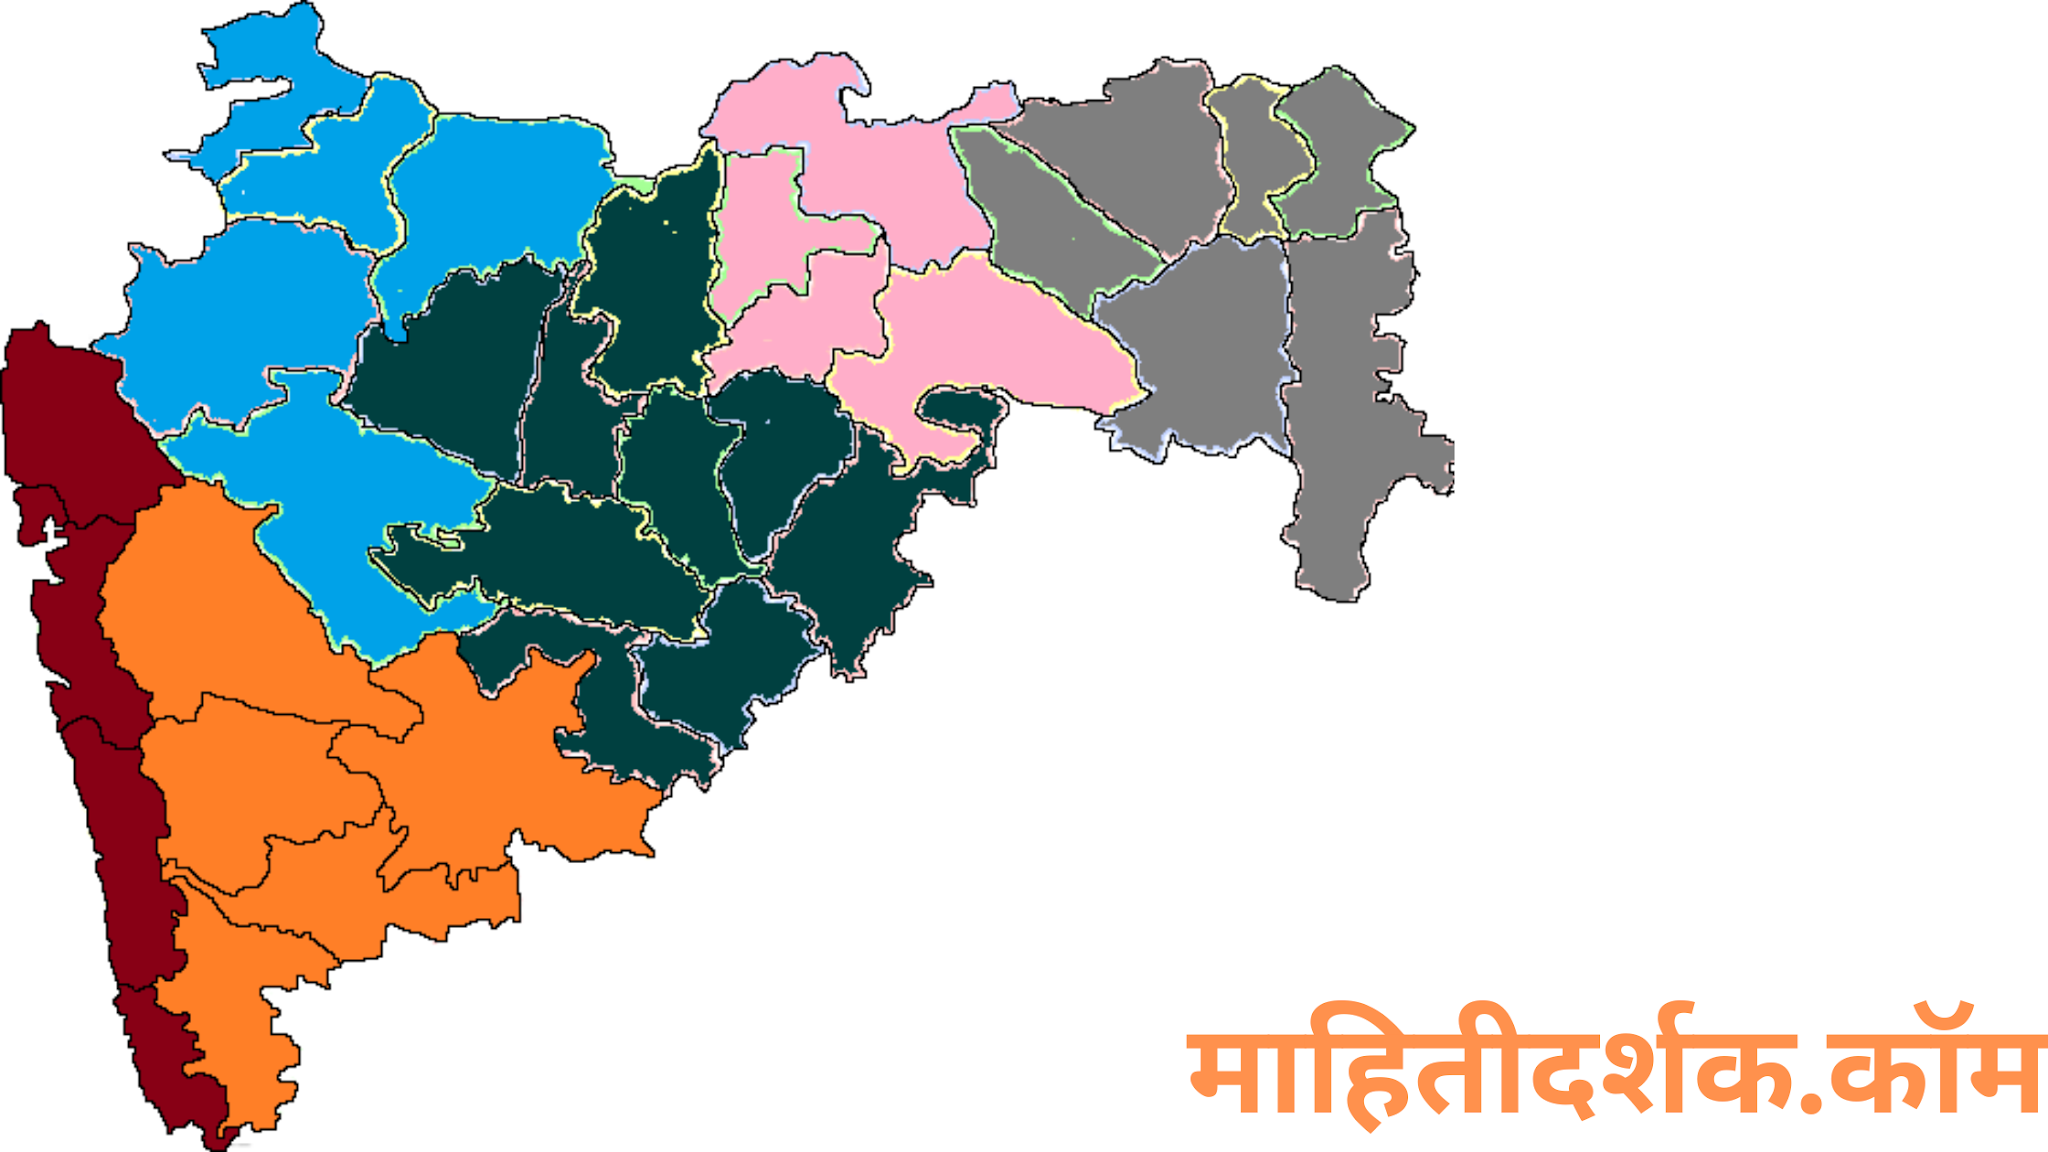 Maharashtra division full information in Marathi